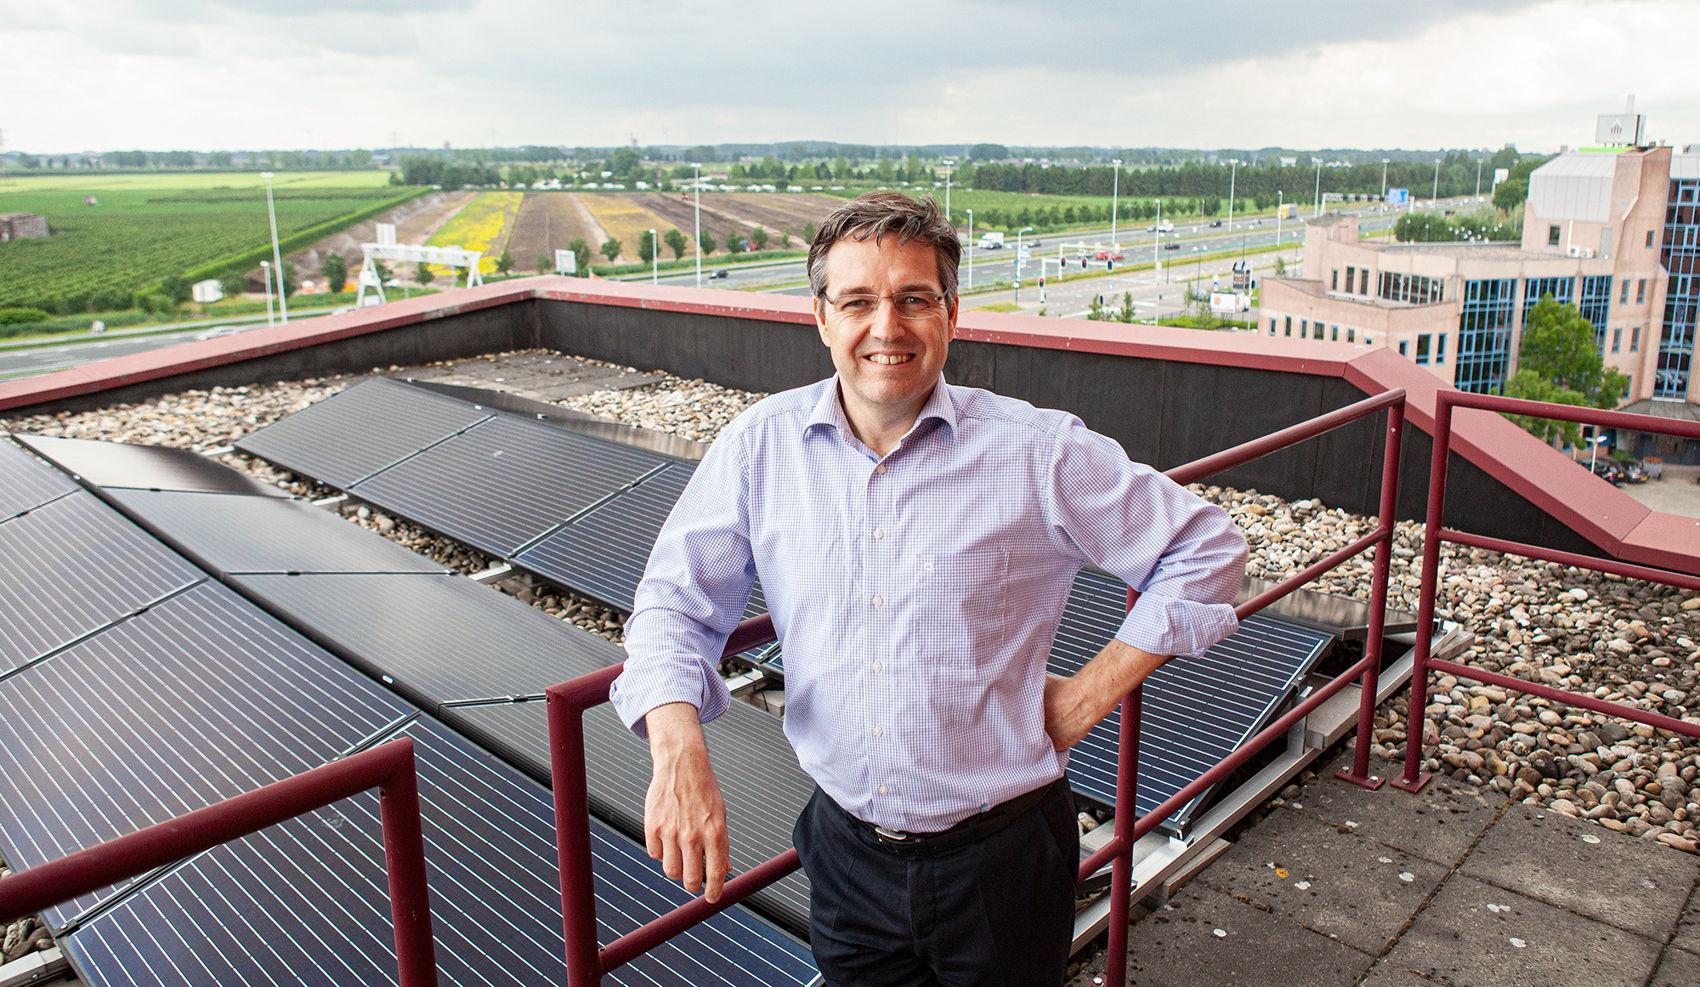 Guido Frenken, Chief Operating Officer Energie ENGIE Nederland